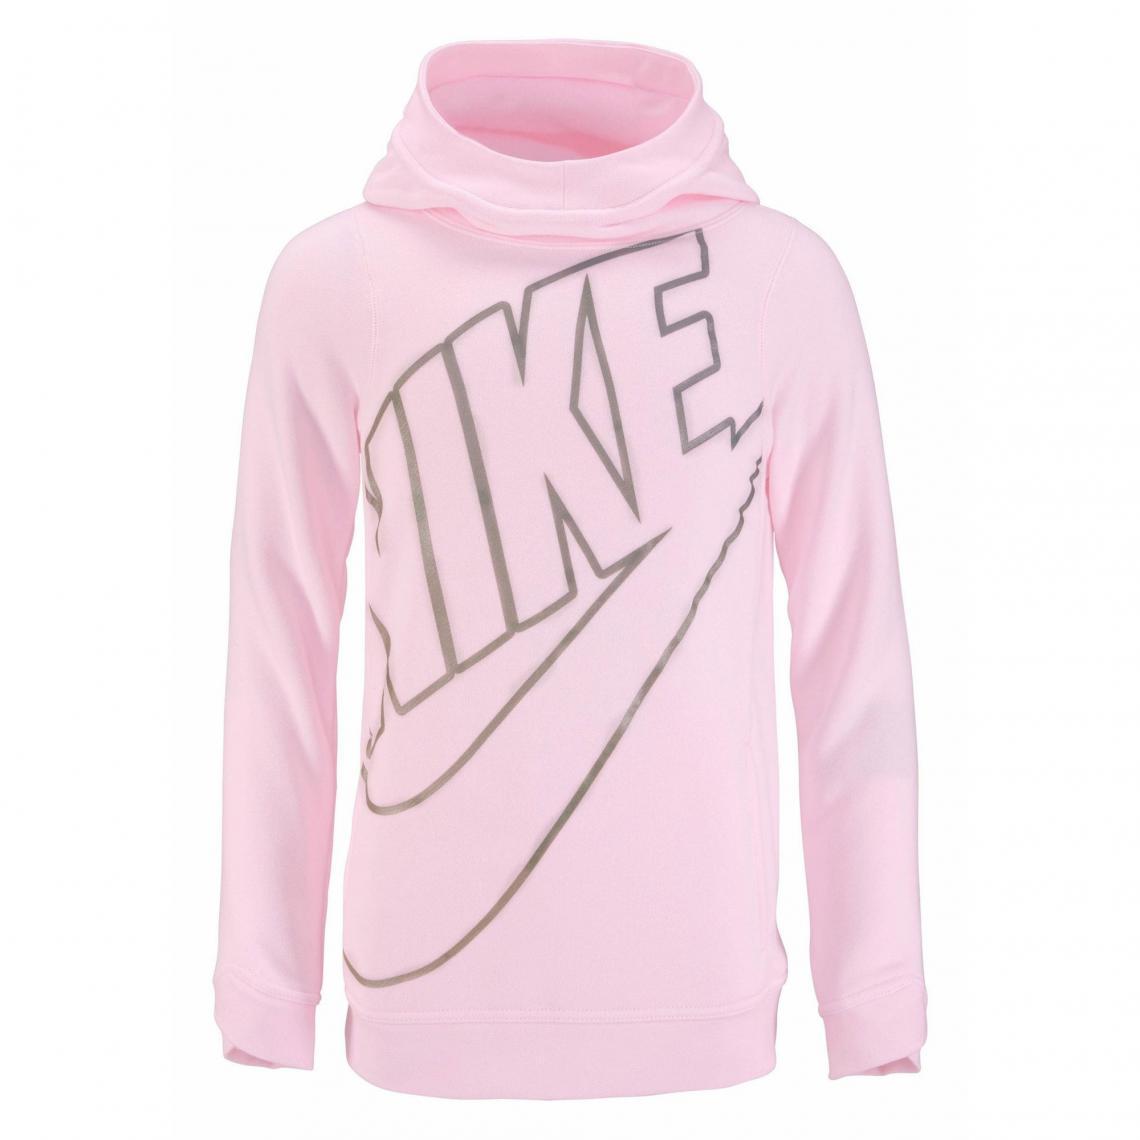 1b10ddcb7e606 Sweat enfilable à capuche fille Nike - Rose Nike